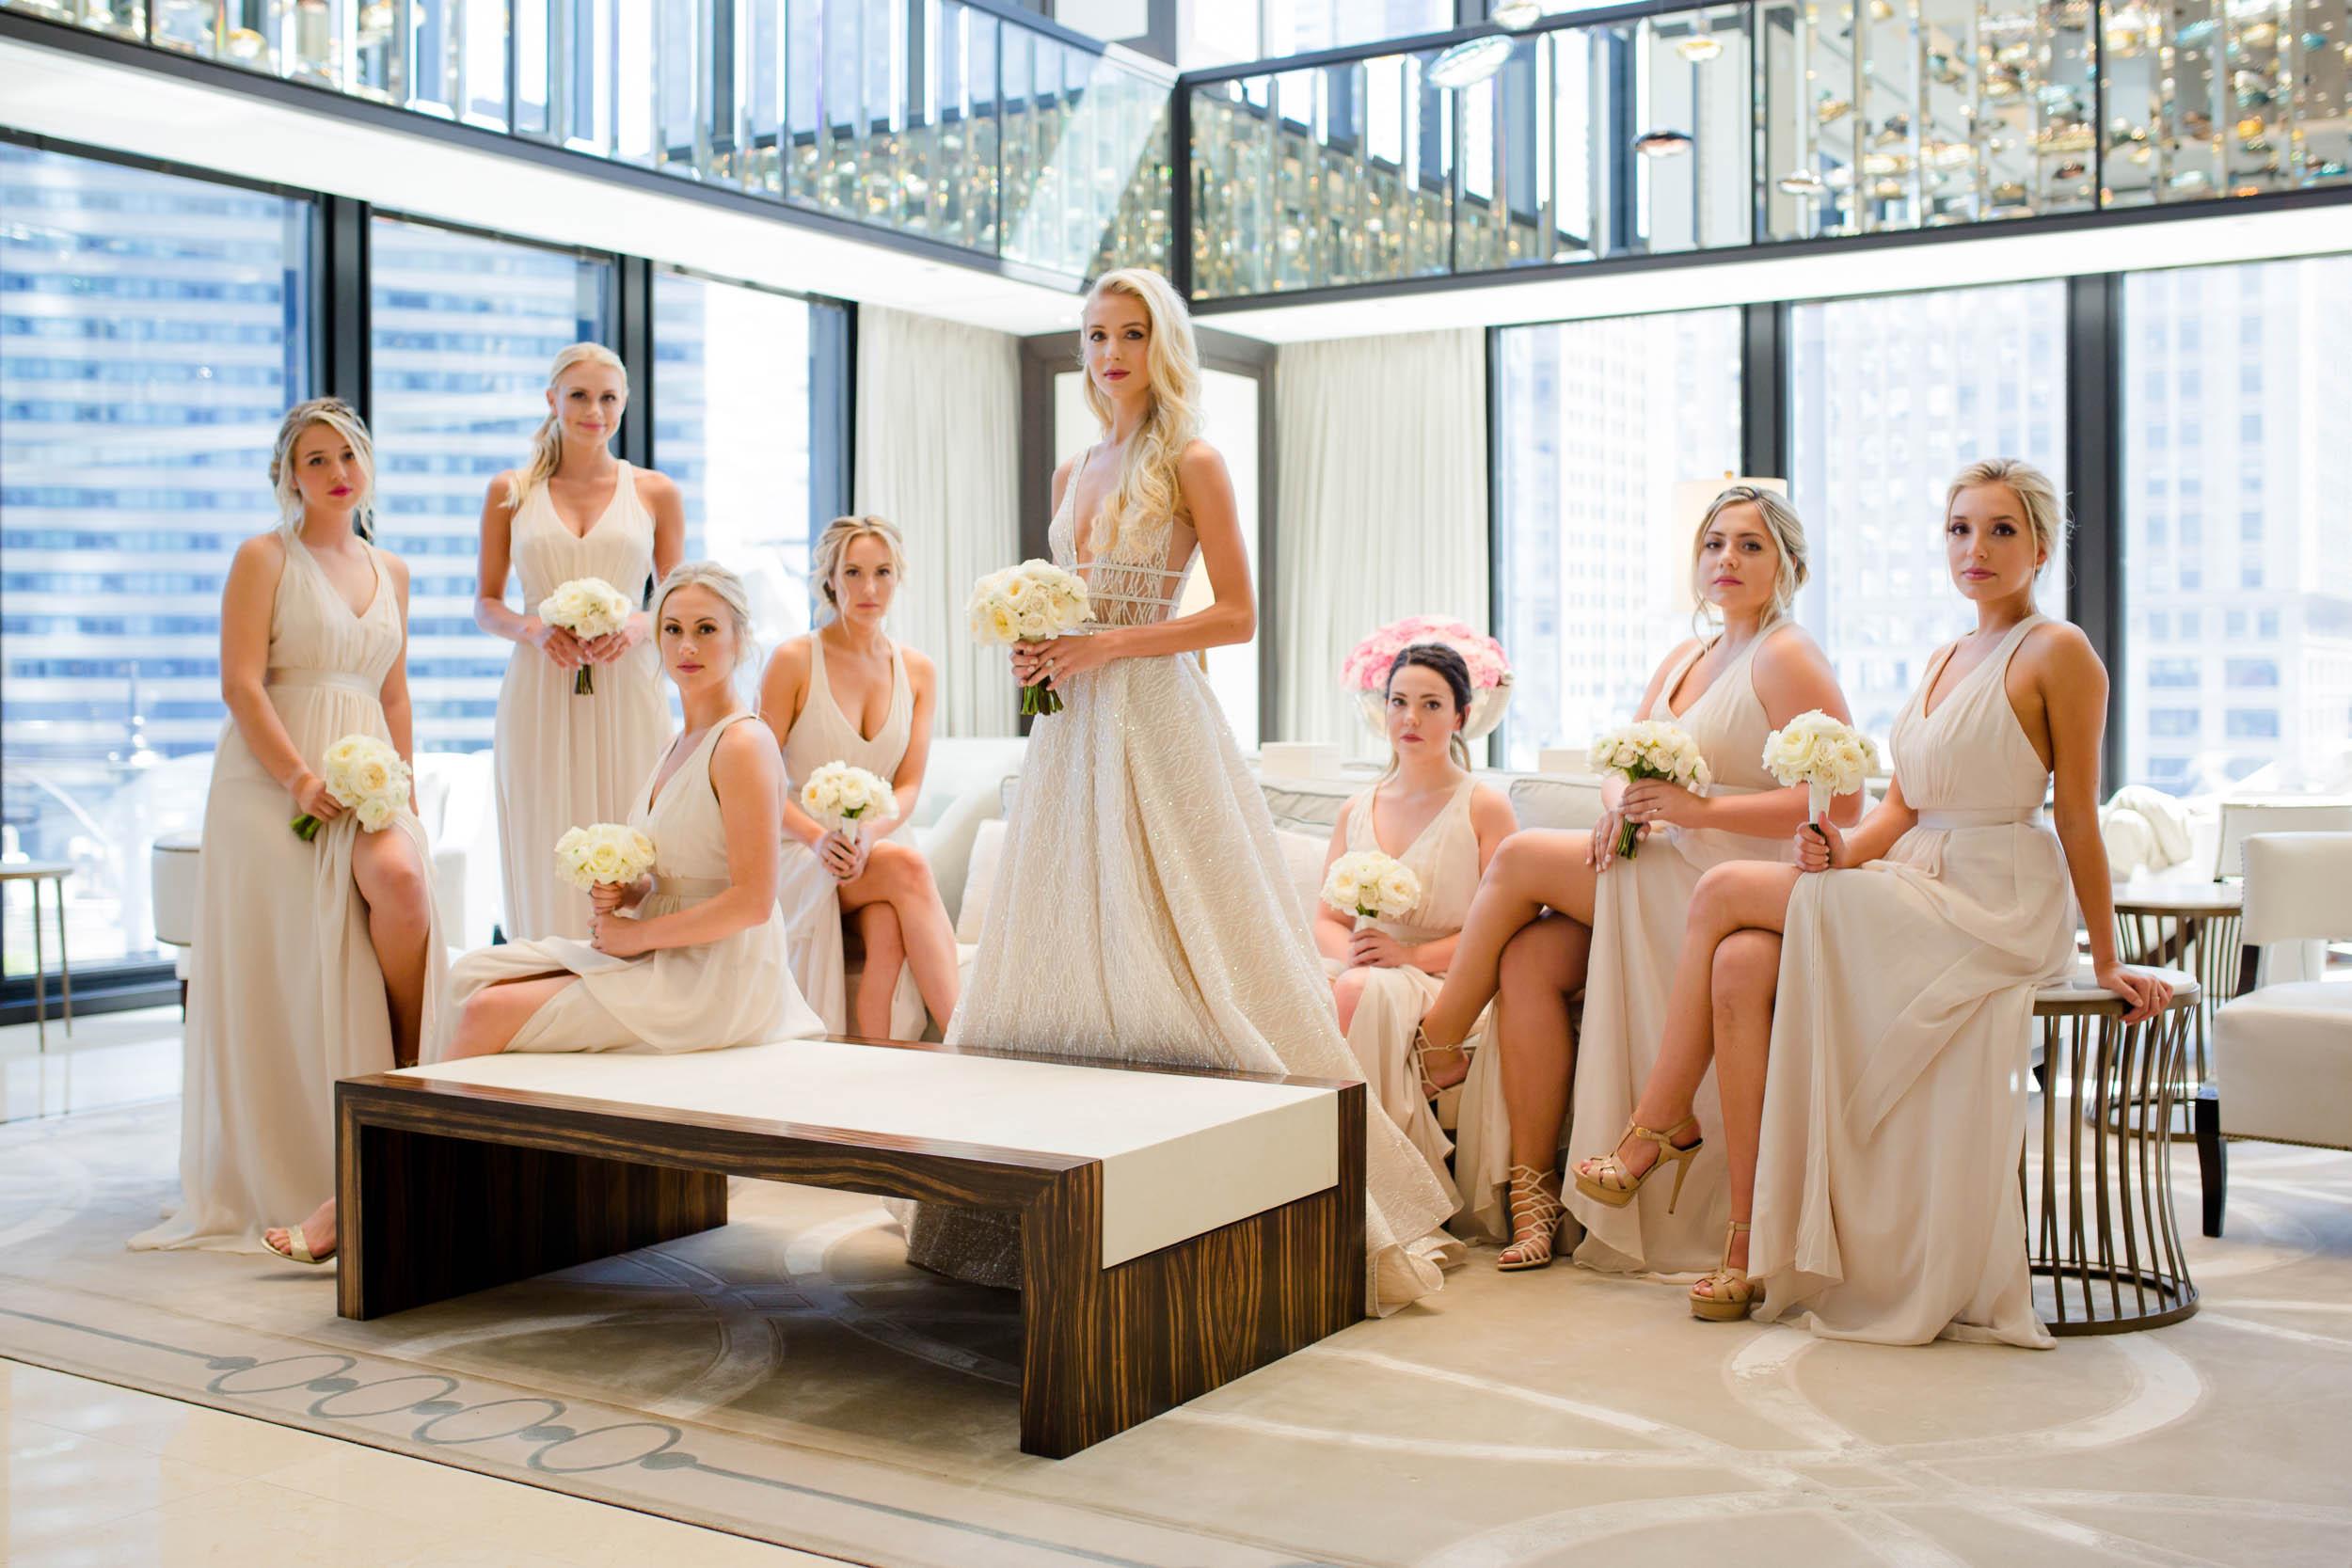 chicago-illuminating-co-wedding-photos-15.jpg